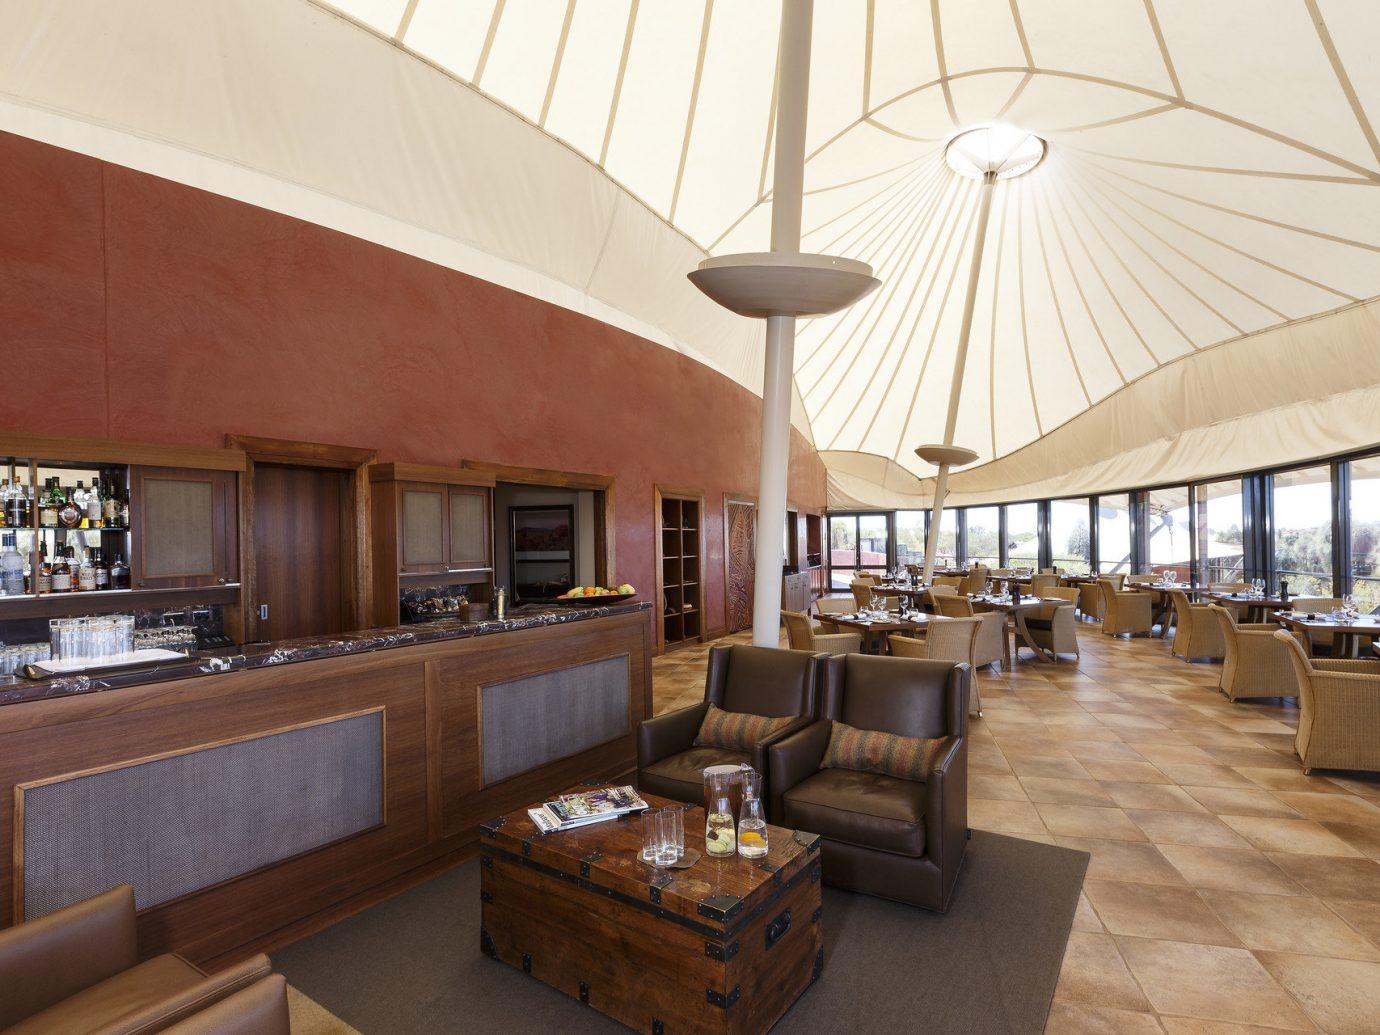 All-Inclusive Resorts Hotels Romantic Hotels indoor floor ceiling property room estate interior design restaurant Lobby real estate Resort Design furniture area